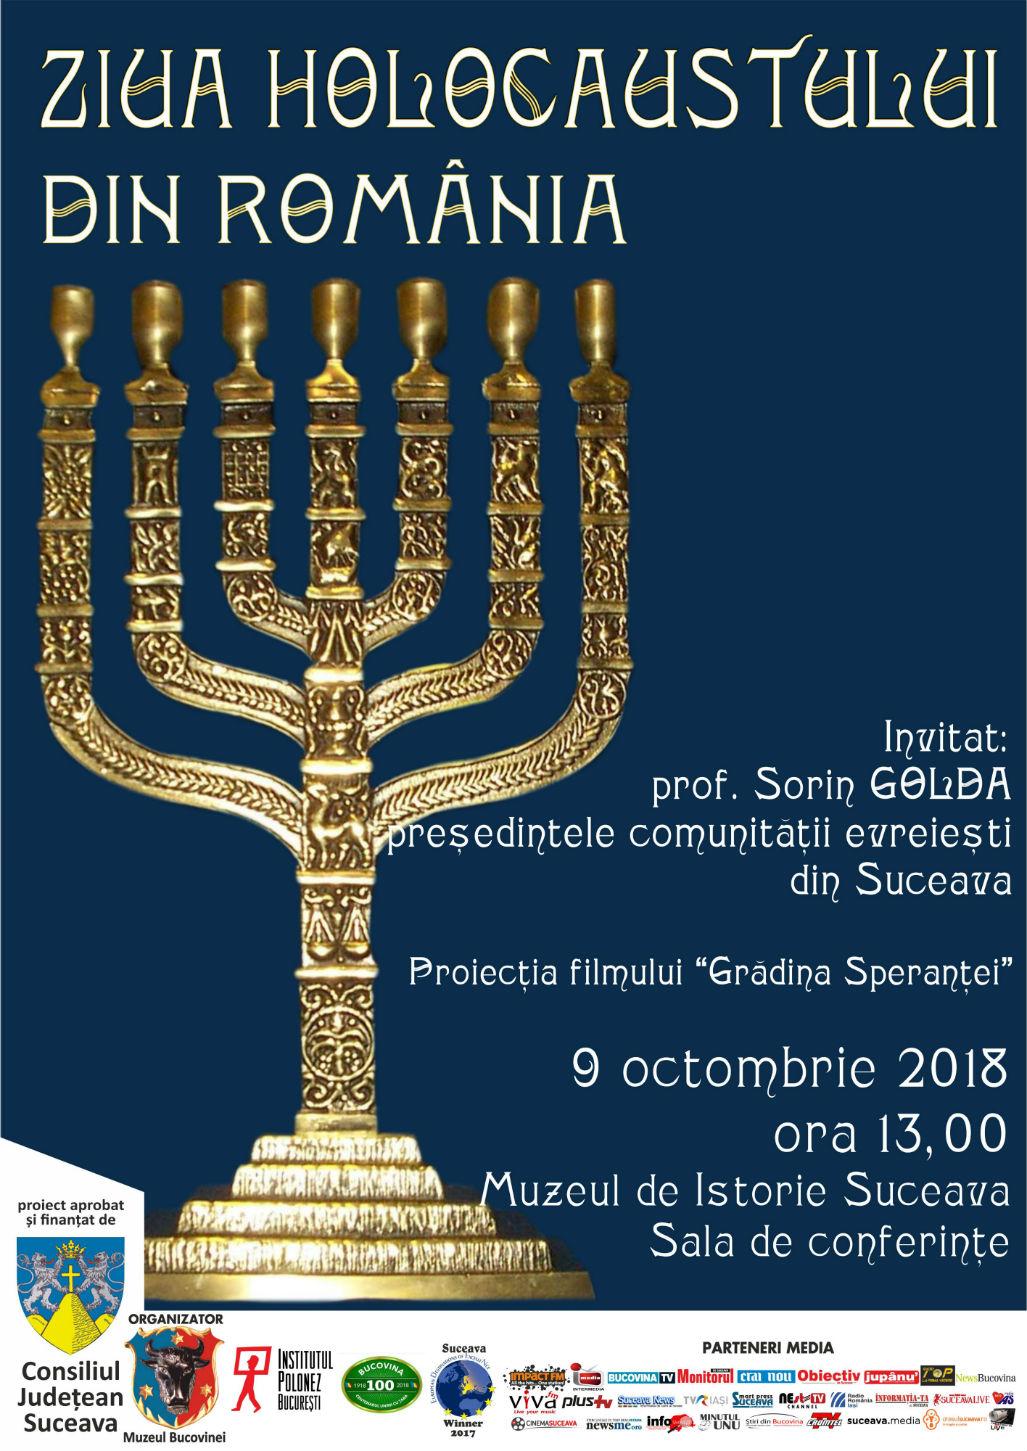 afis evrei cu logo polonez 2018 rgb